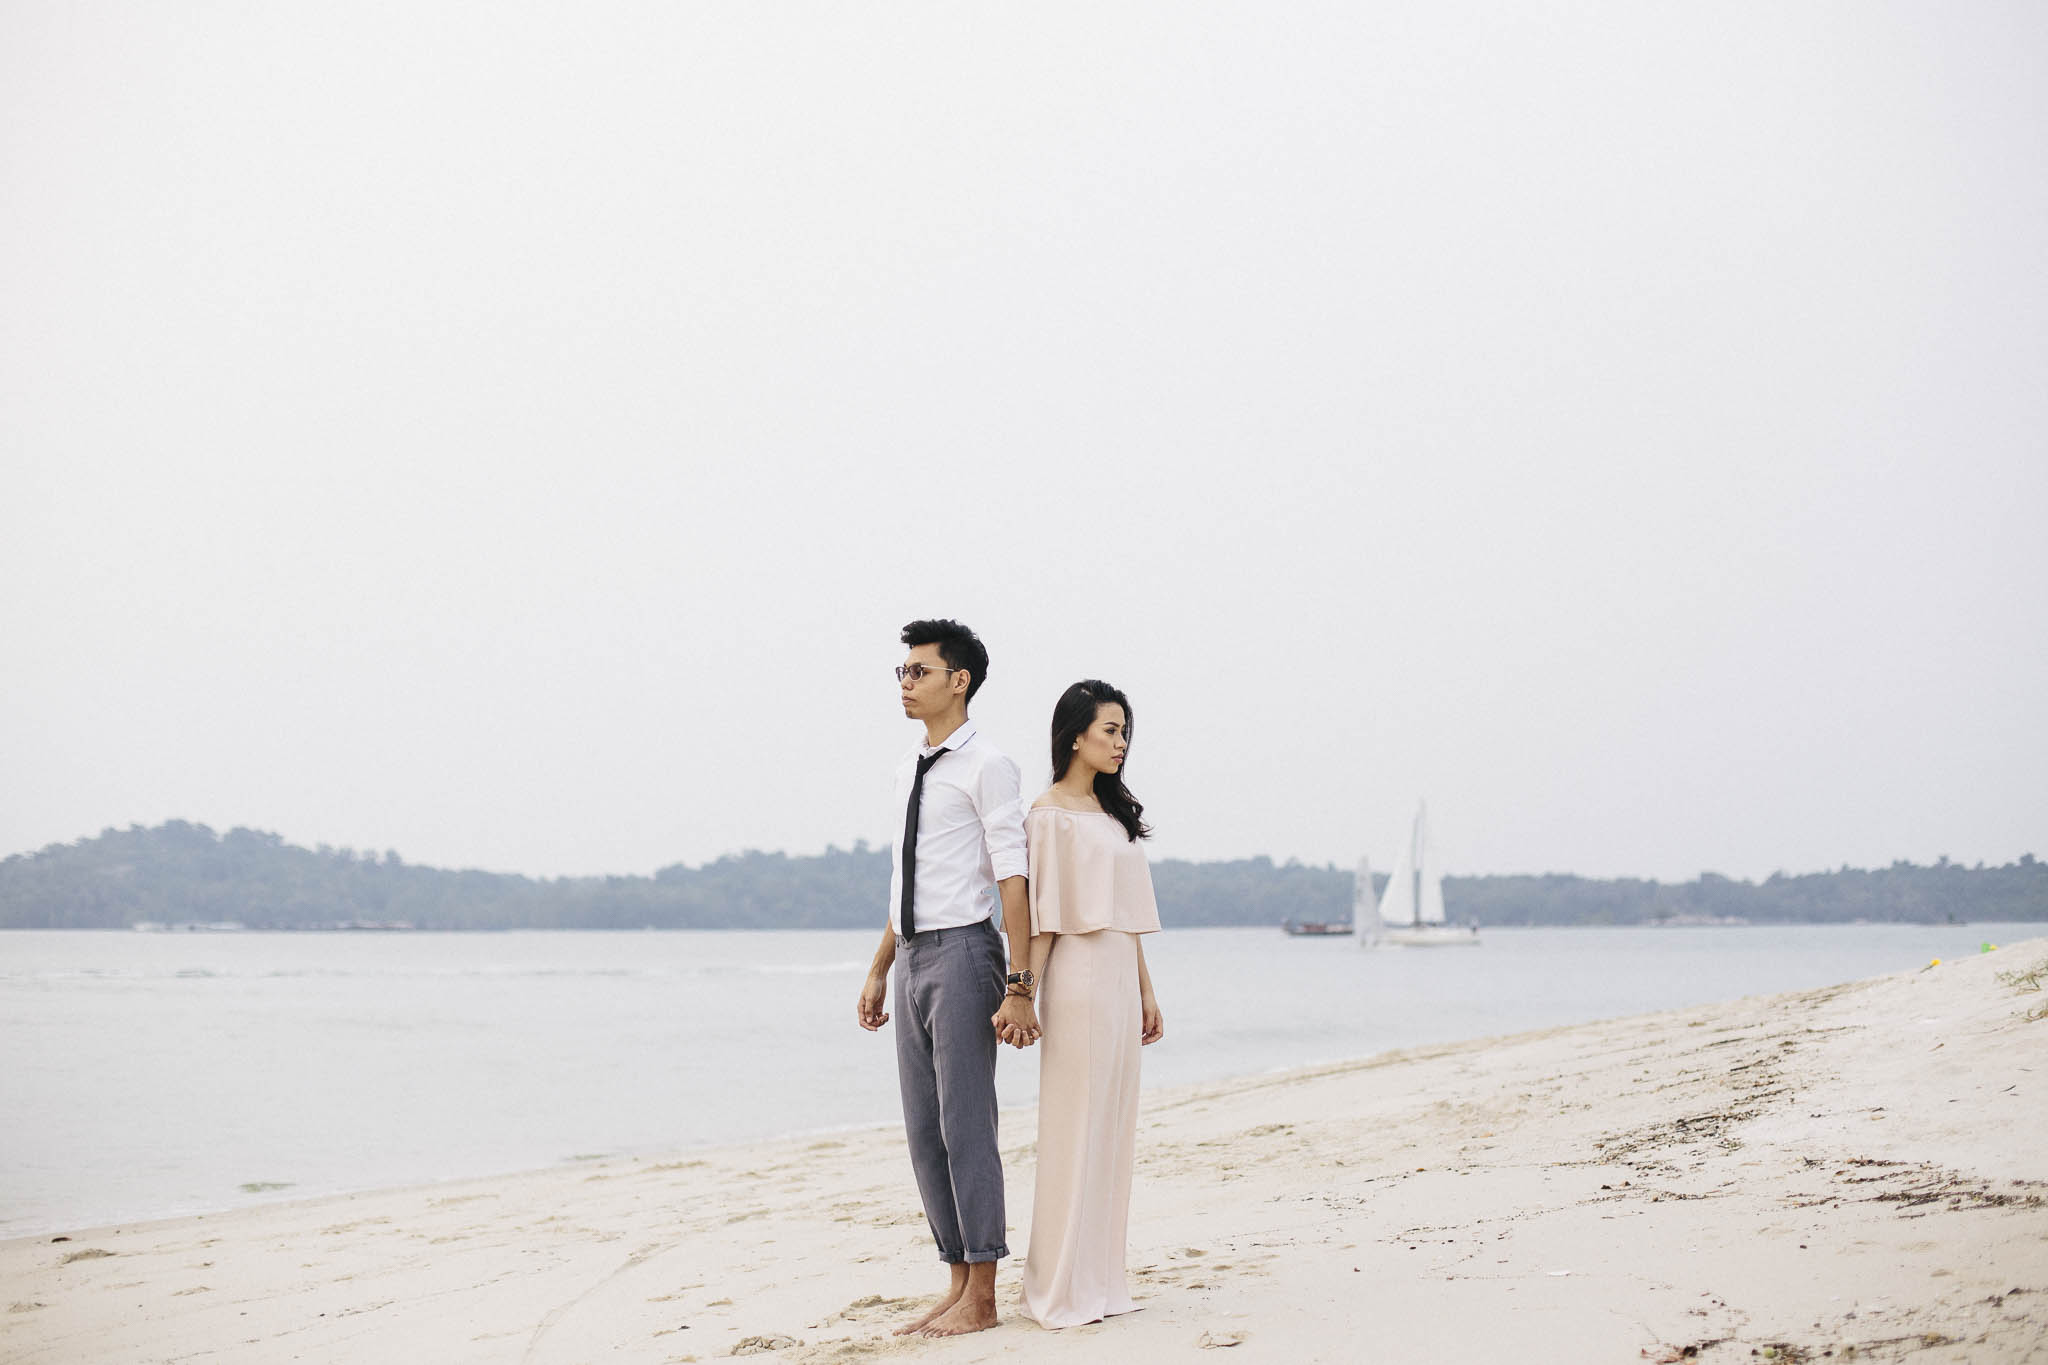 singapore-wedding-photographer-malay-travel-adli-tashah-29.jpg